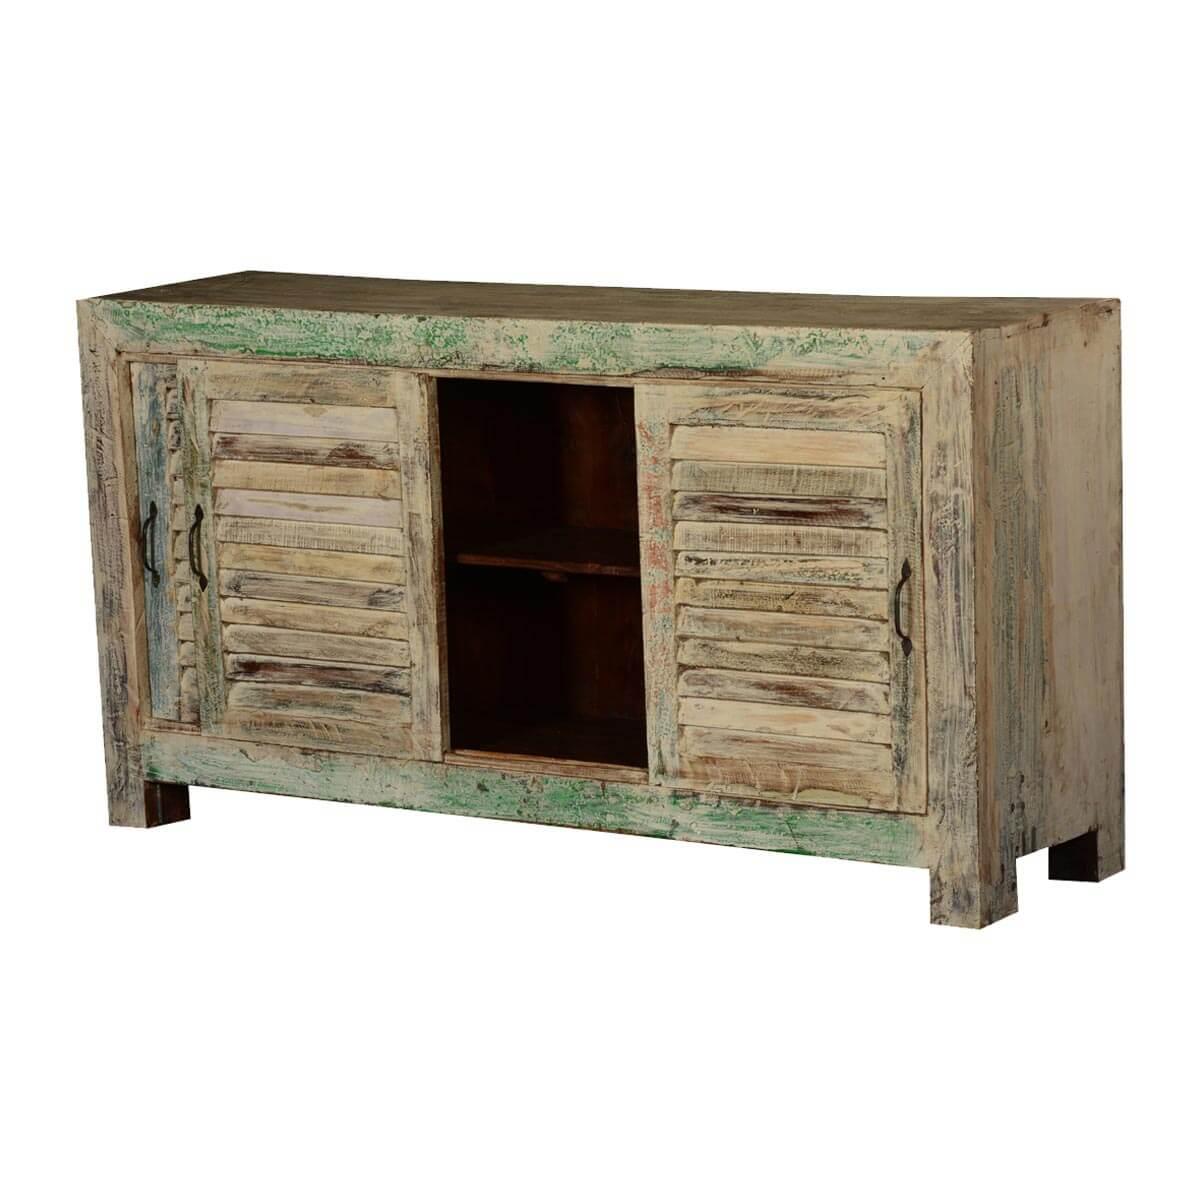 Winter White Rustic Reclaimed Wood Sliding Door Buffet Cabinet